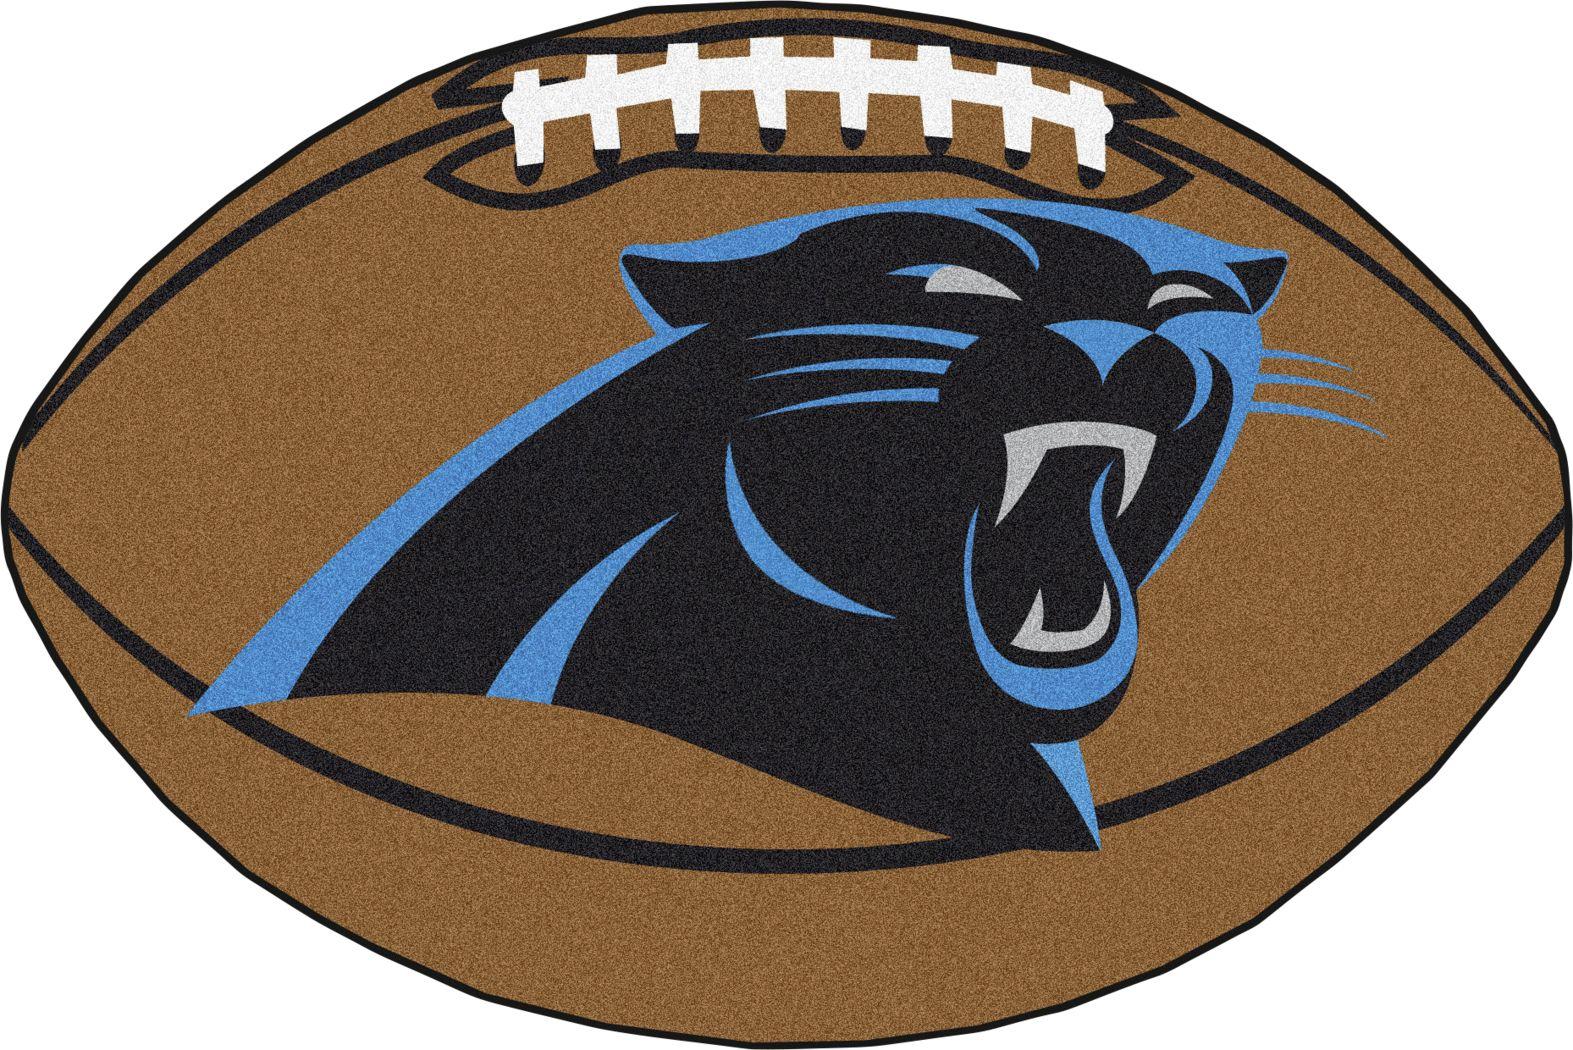 NFL Football Mascot Carolina Panthers 1'6 x 1'10 Rug